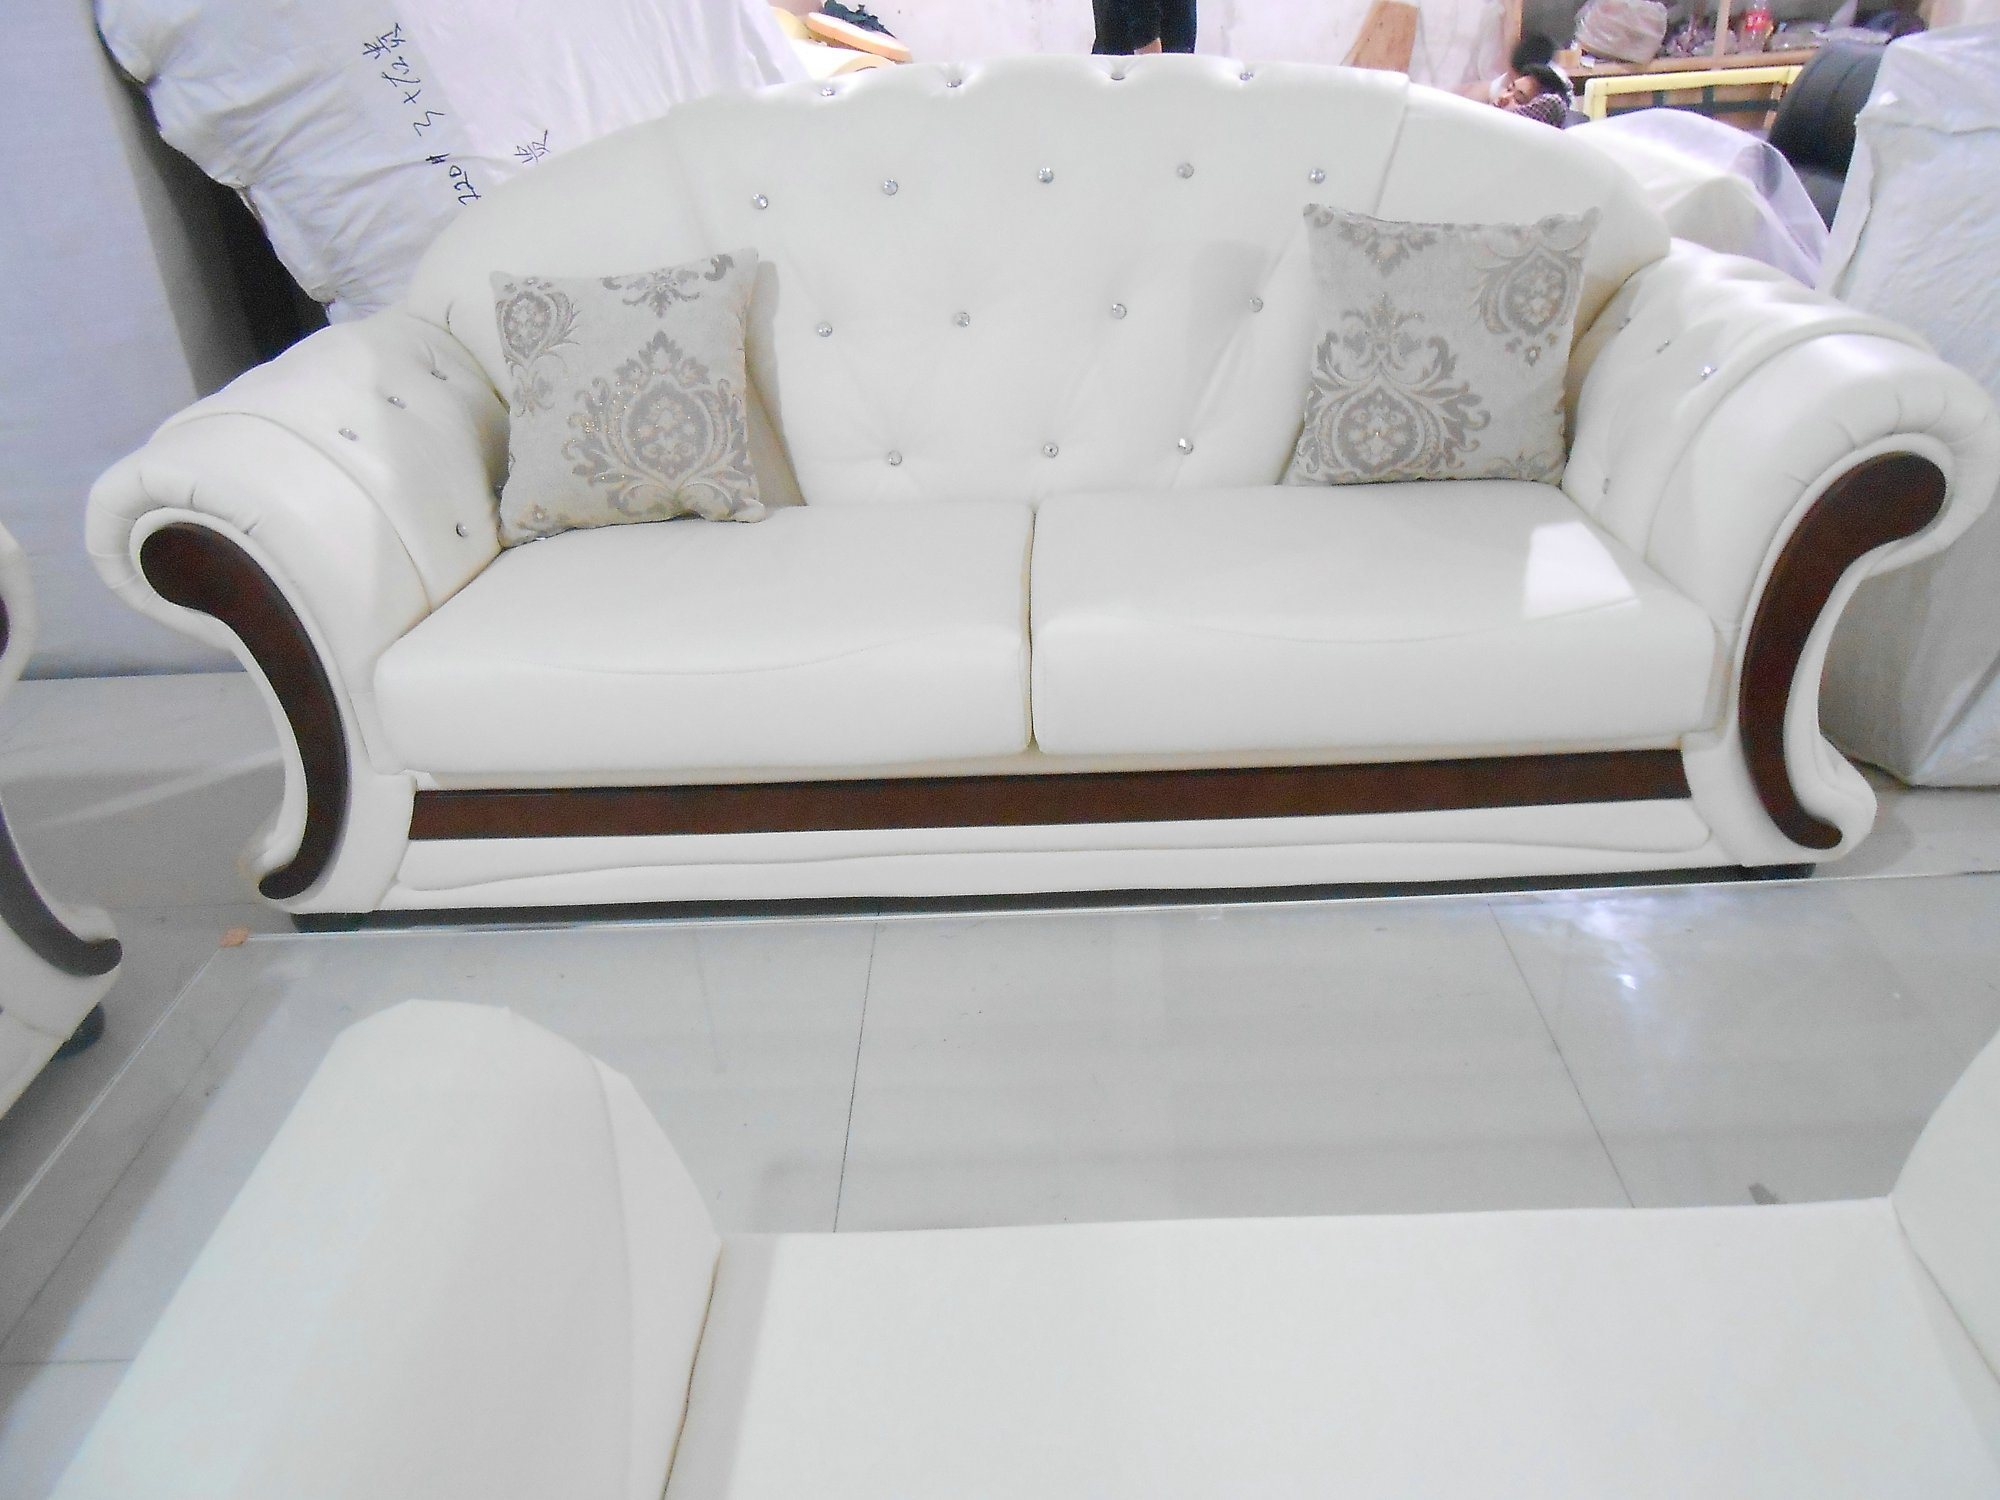 Living Room High Quality Europe Modern Home Furniture Leather Sofa